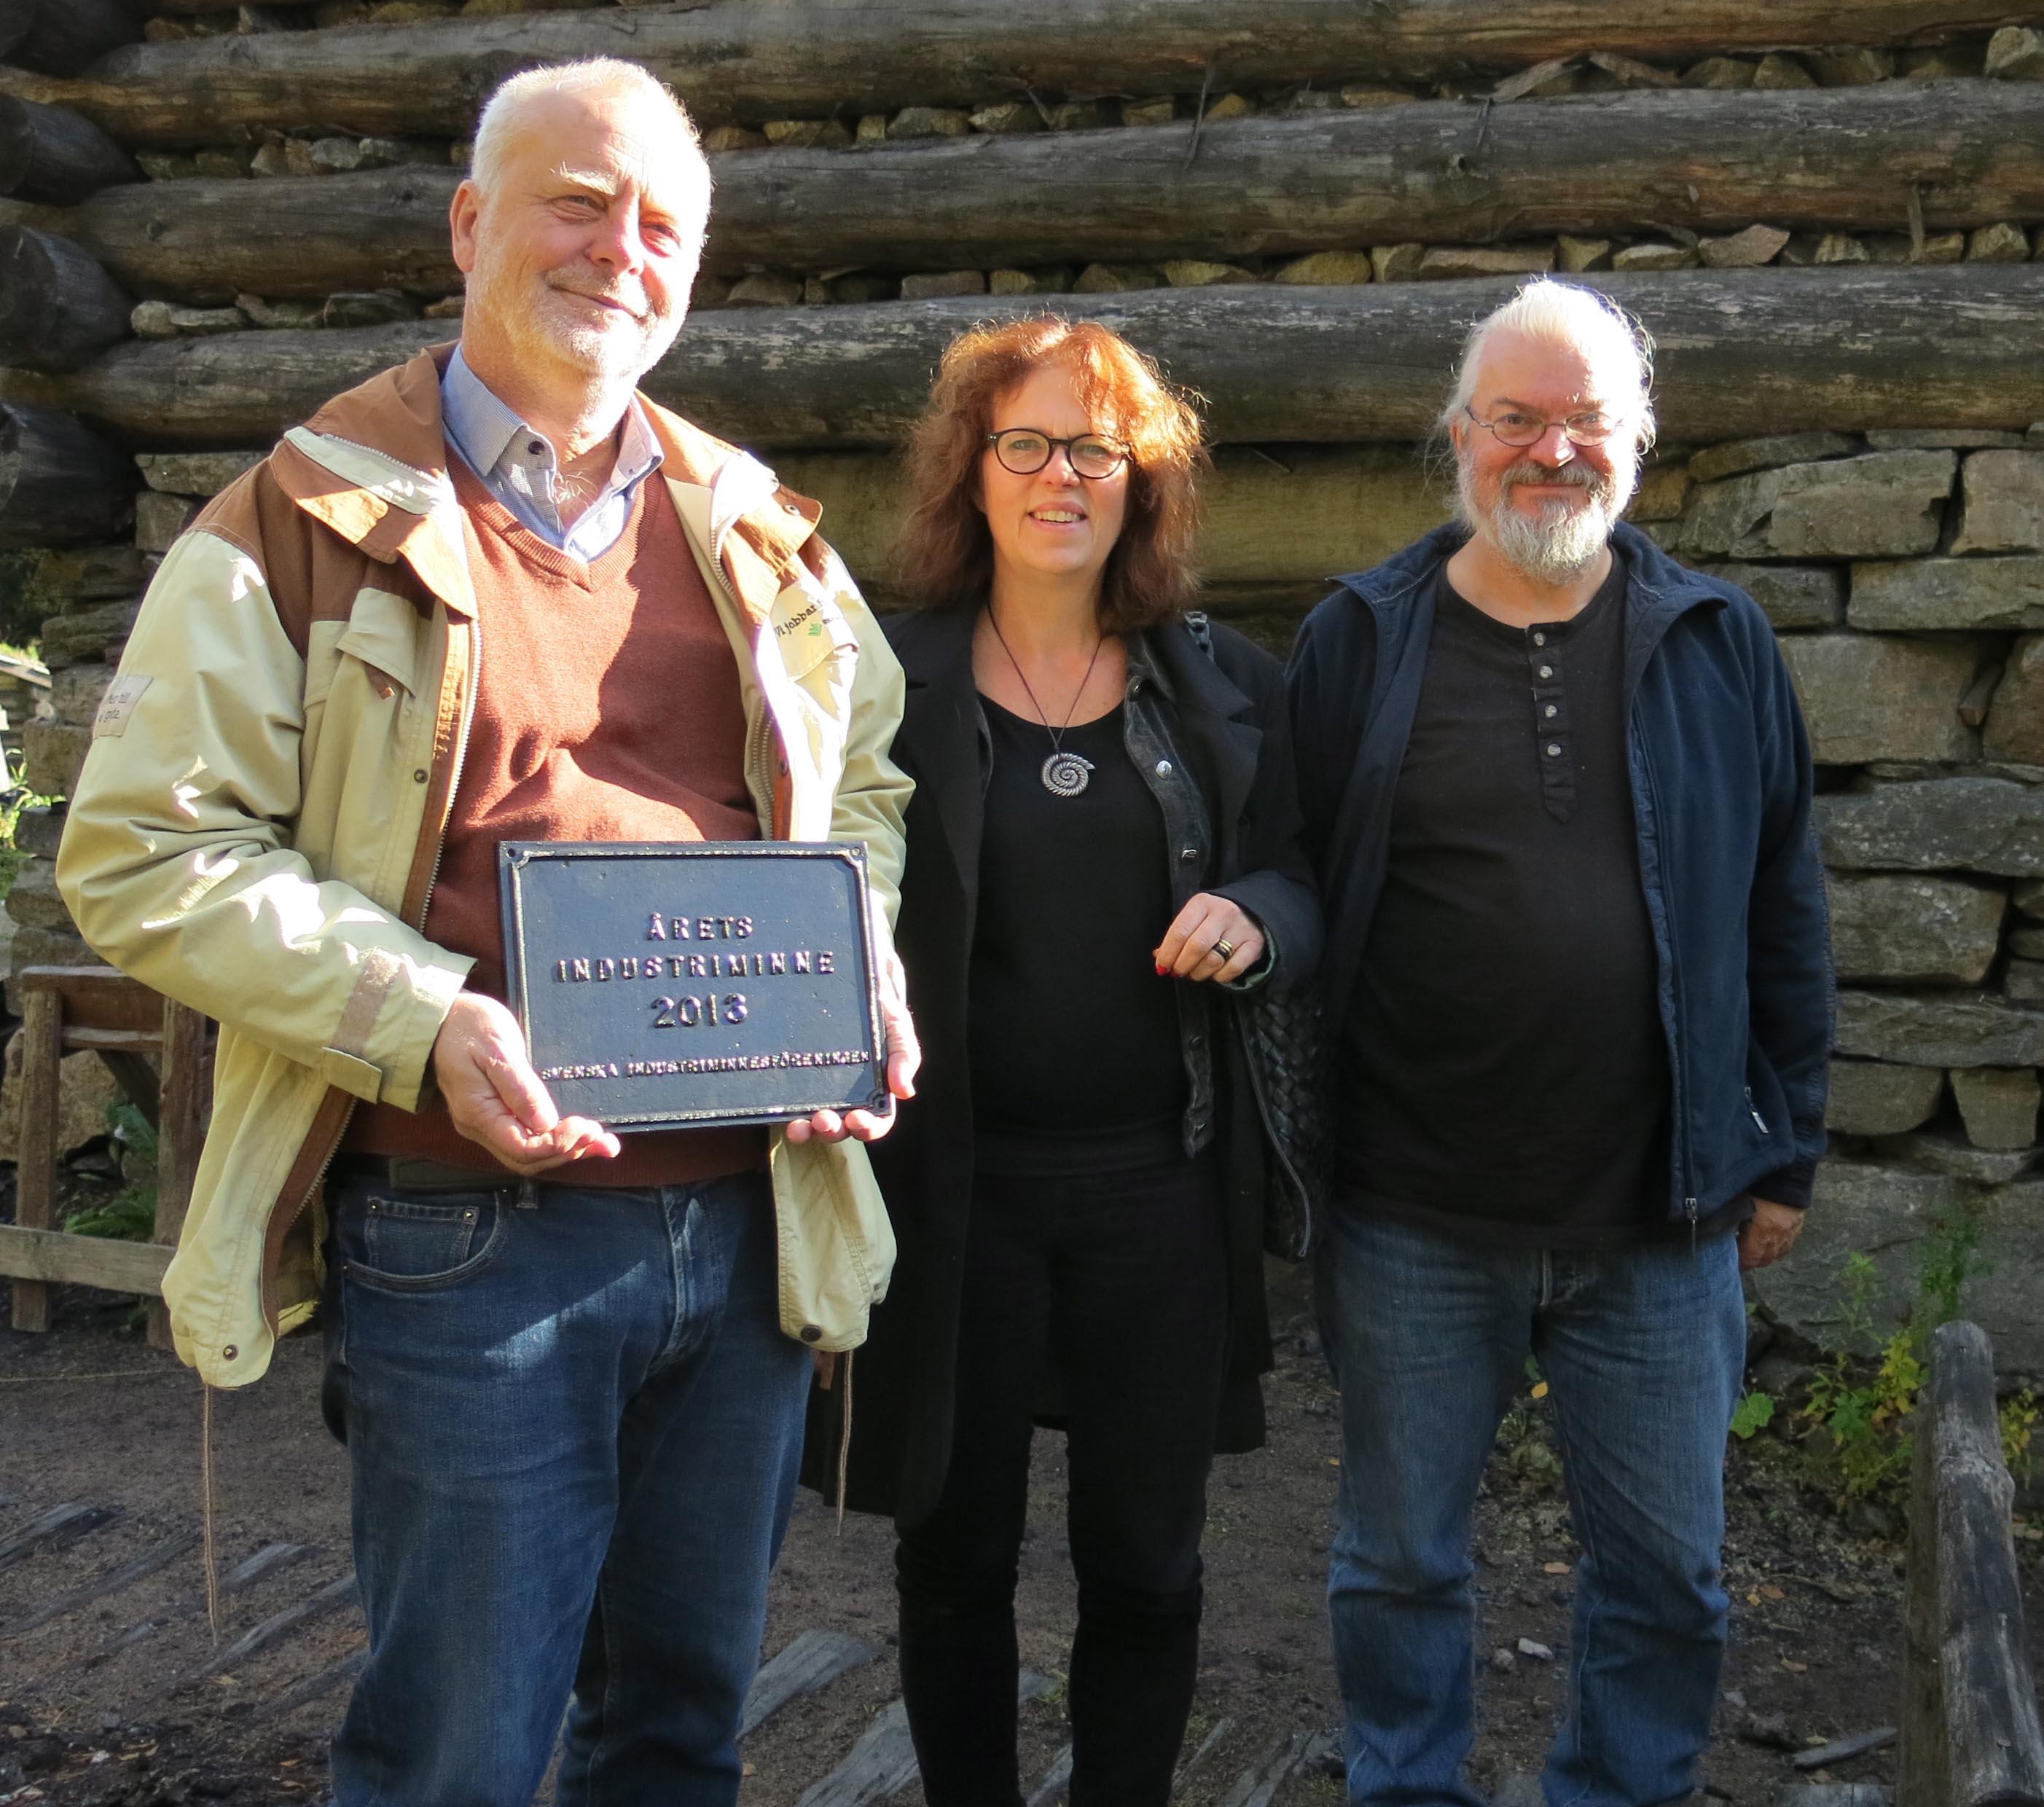 Ulf Öhman, Ing-Marie Petterson Jensen och Lars-Erik Lärnemark.